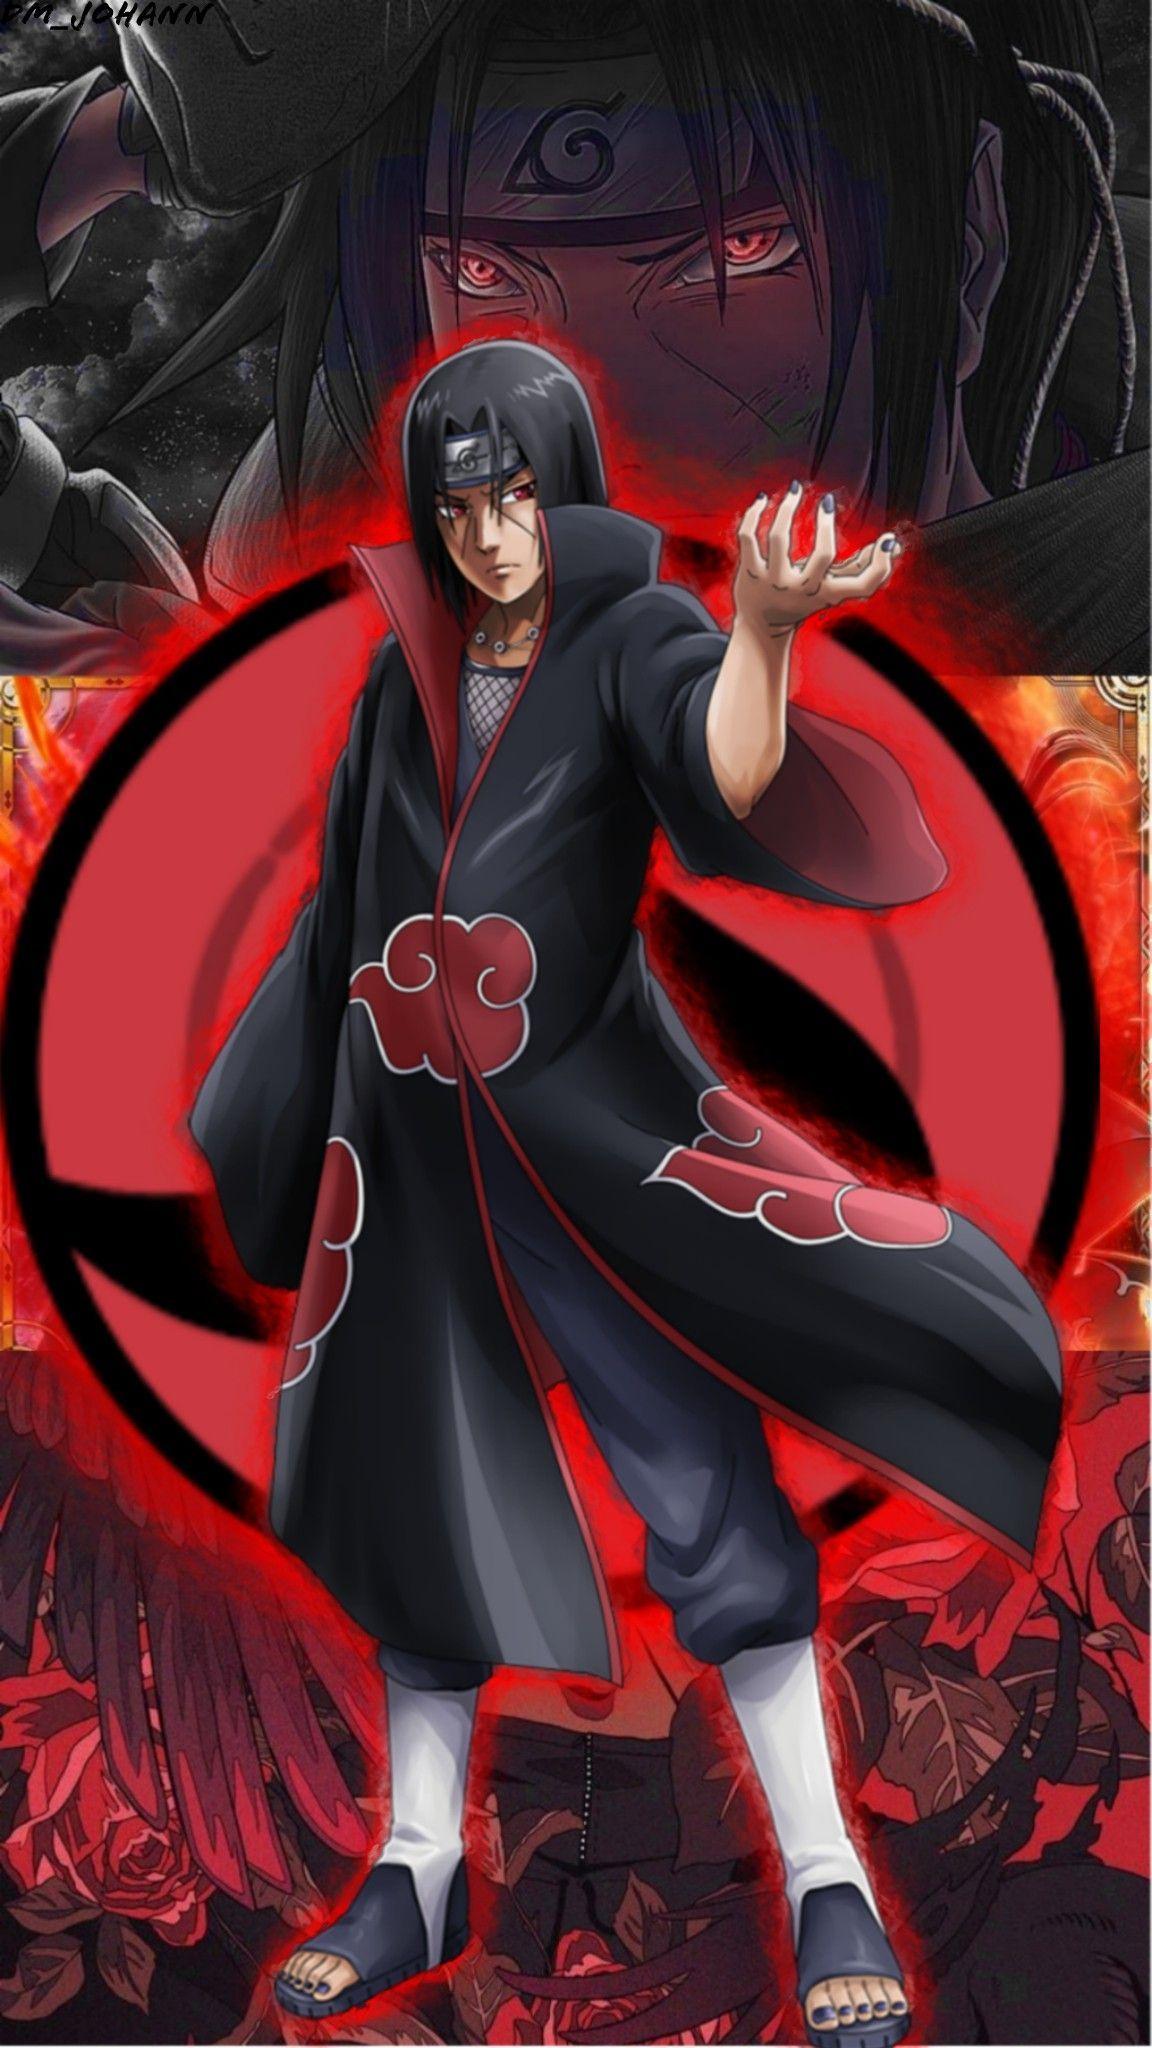 Naruto Shippuden Wallpaper In 2020 Itachi Uchiha Sakura And Sasuke Itachi In 2020 Itachi Uchiha Art Itachi Uchiha Naruto Shippuden Sasuke